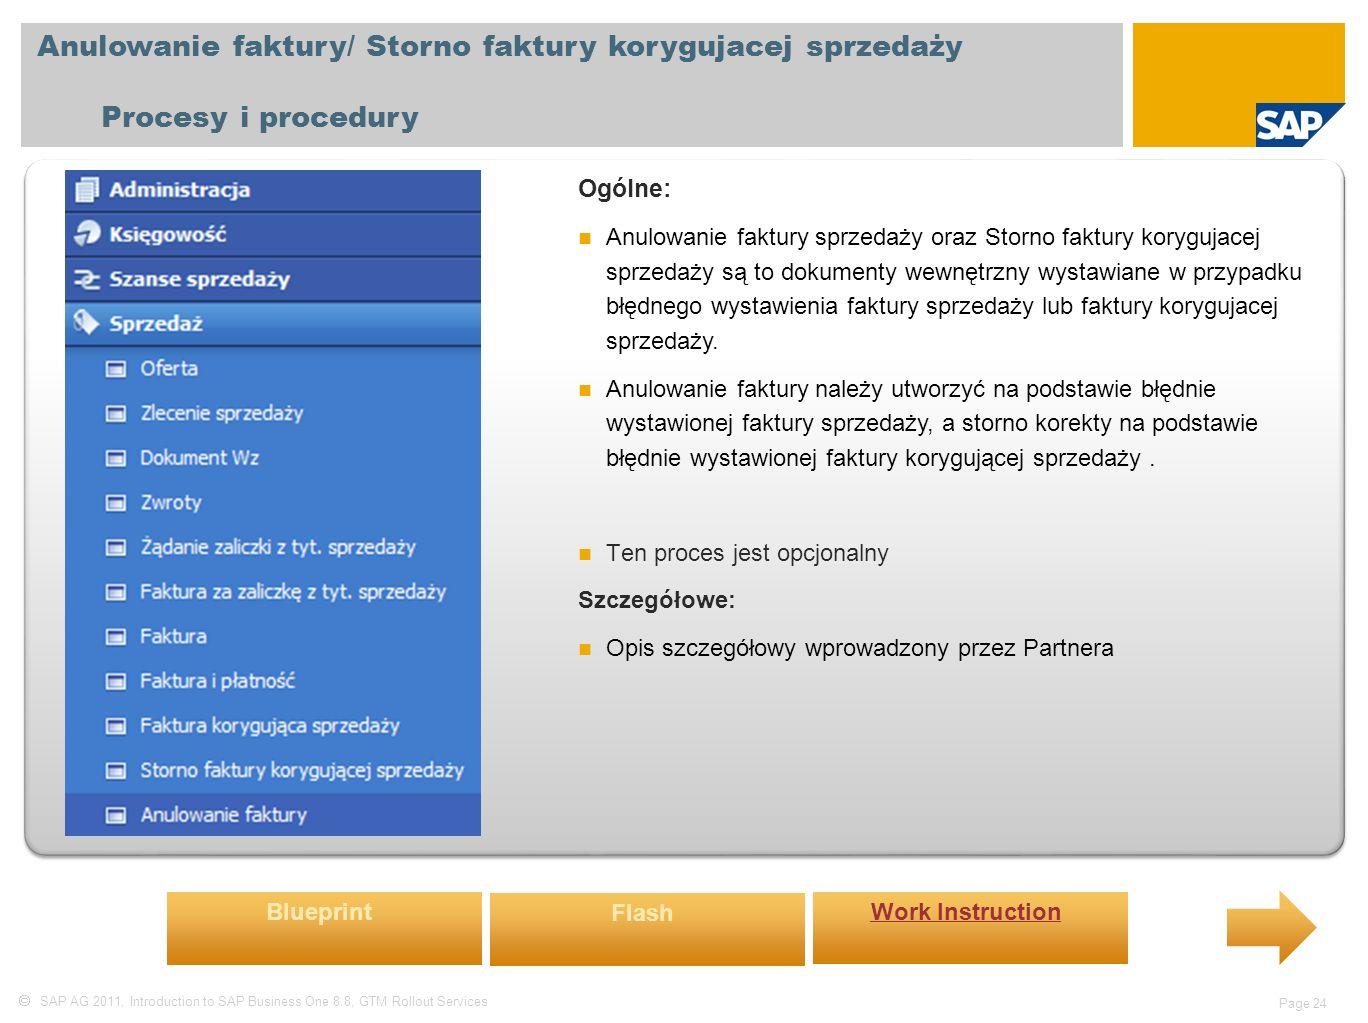  SAP AG 2011, Introduction to SAP Business One 8.8, GTM Rollout Services Page 24 Anulowanie faktury/ Storno faktury korygujacej sprzedaży Procesy i p